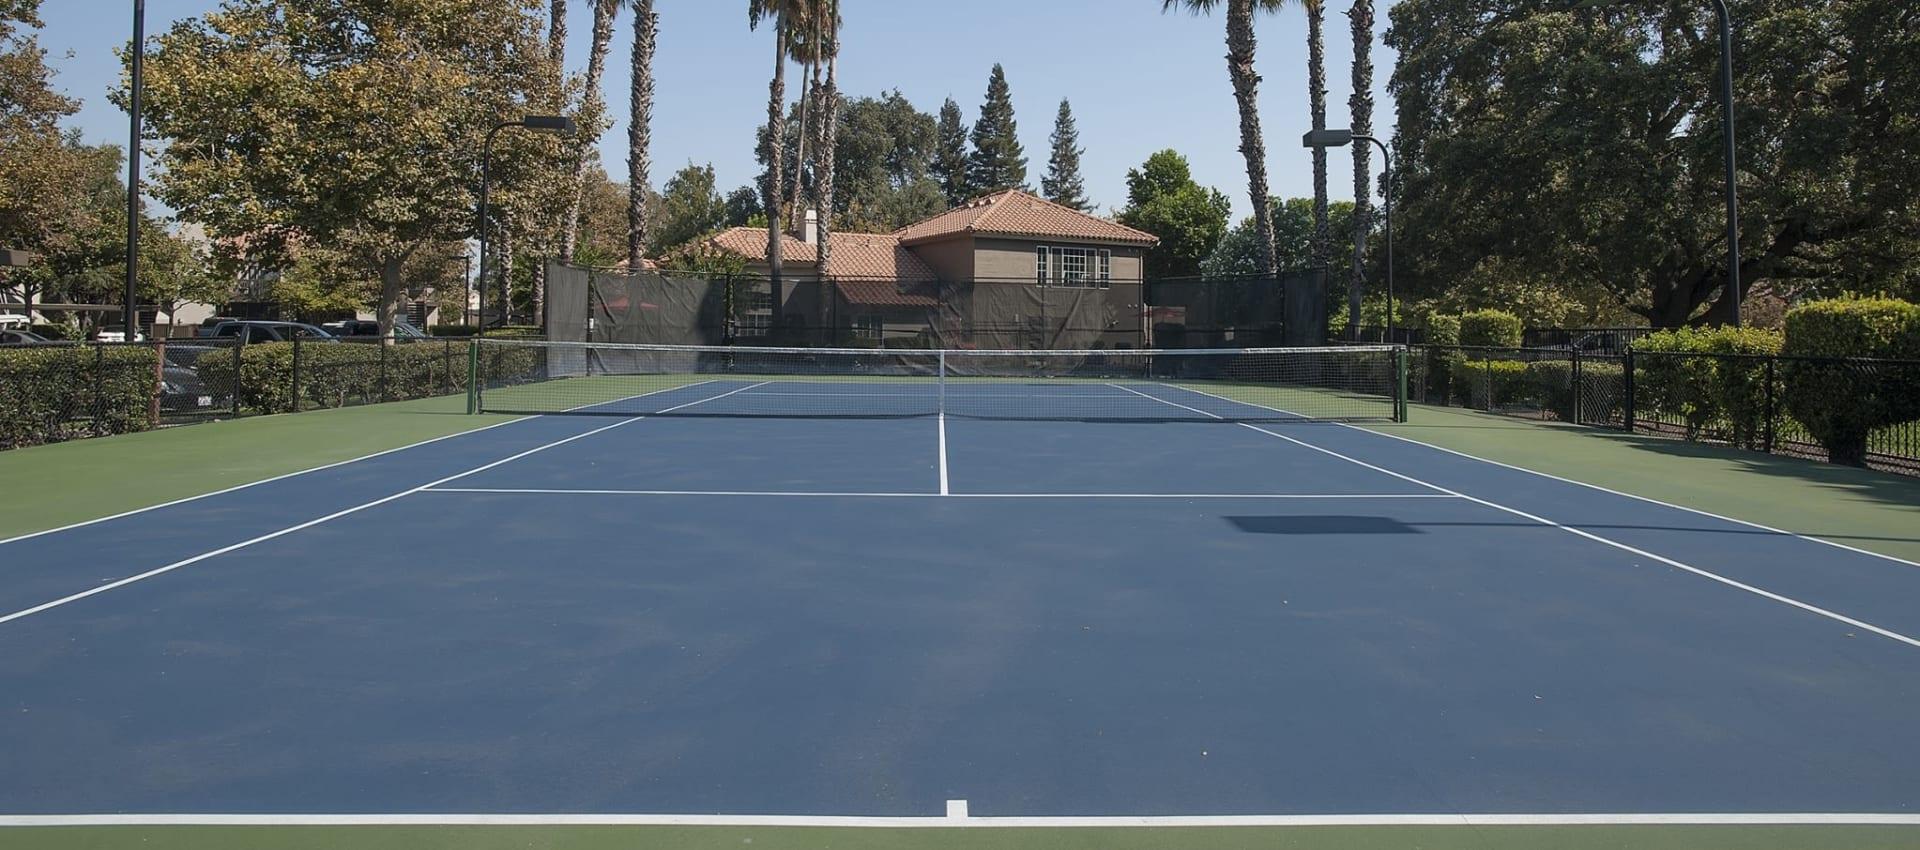 Tennis courts at Shore Park at Riverlake in Sacramento, California